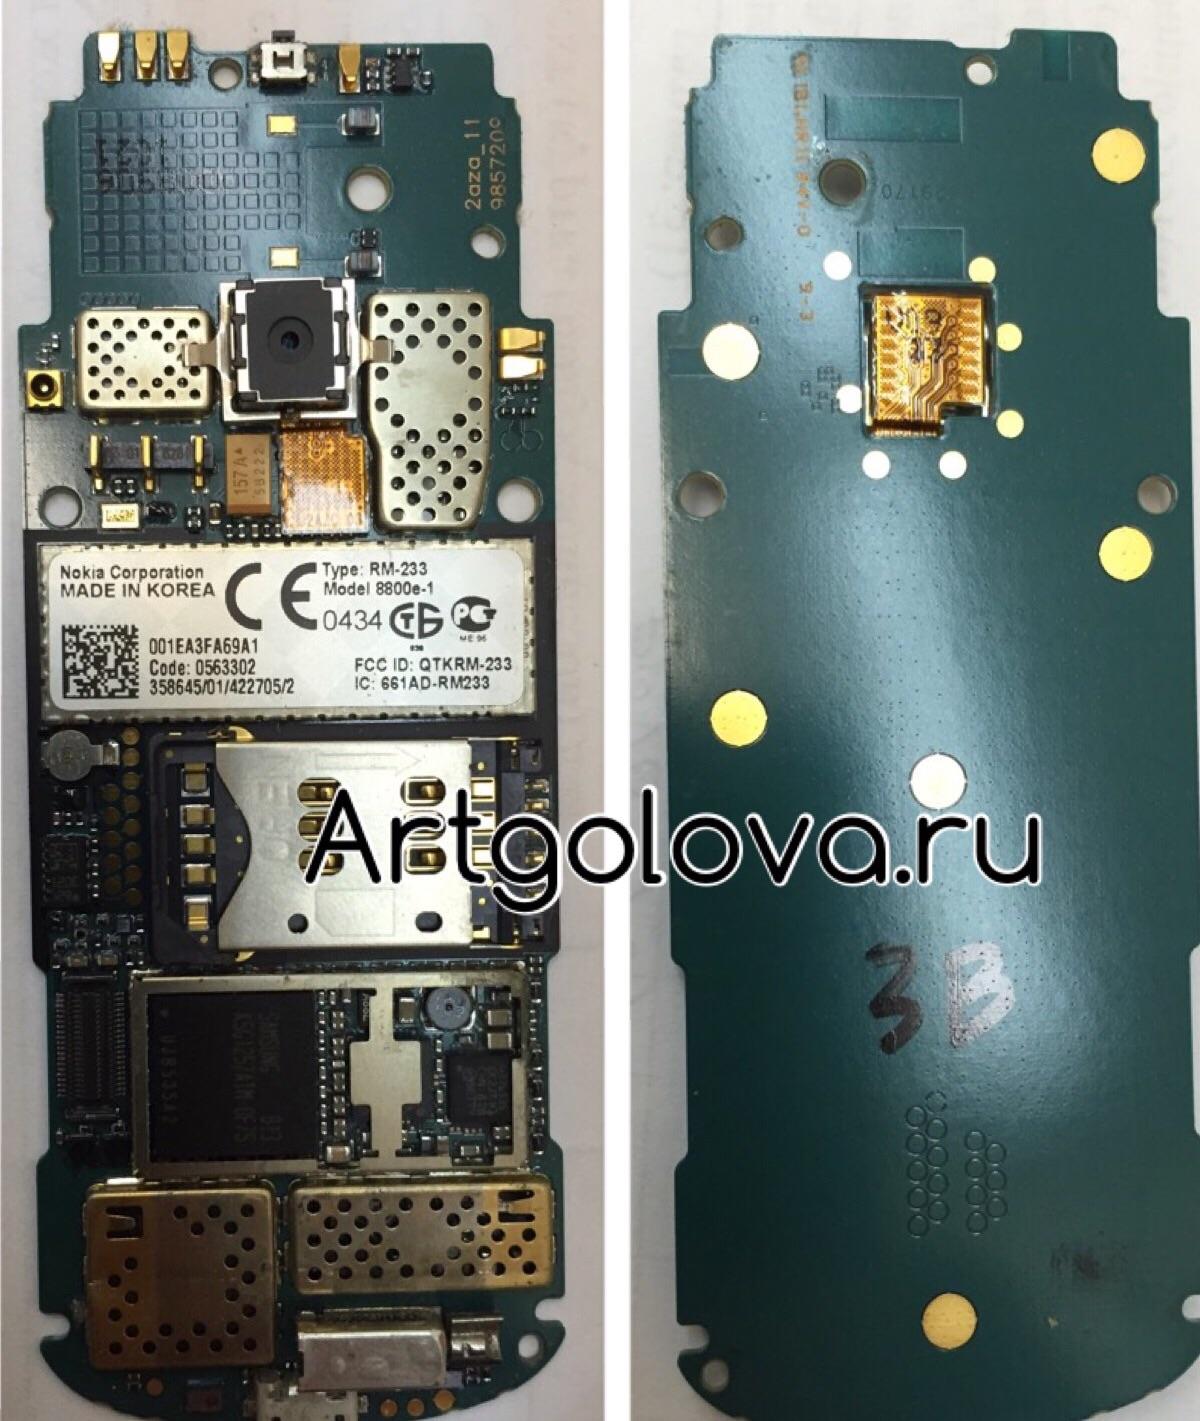 замена стекла на телефоне huawei g700 - ремонт в Москве